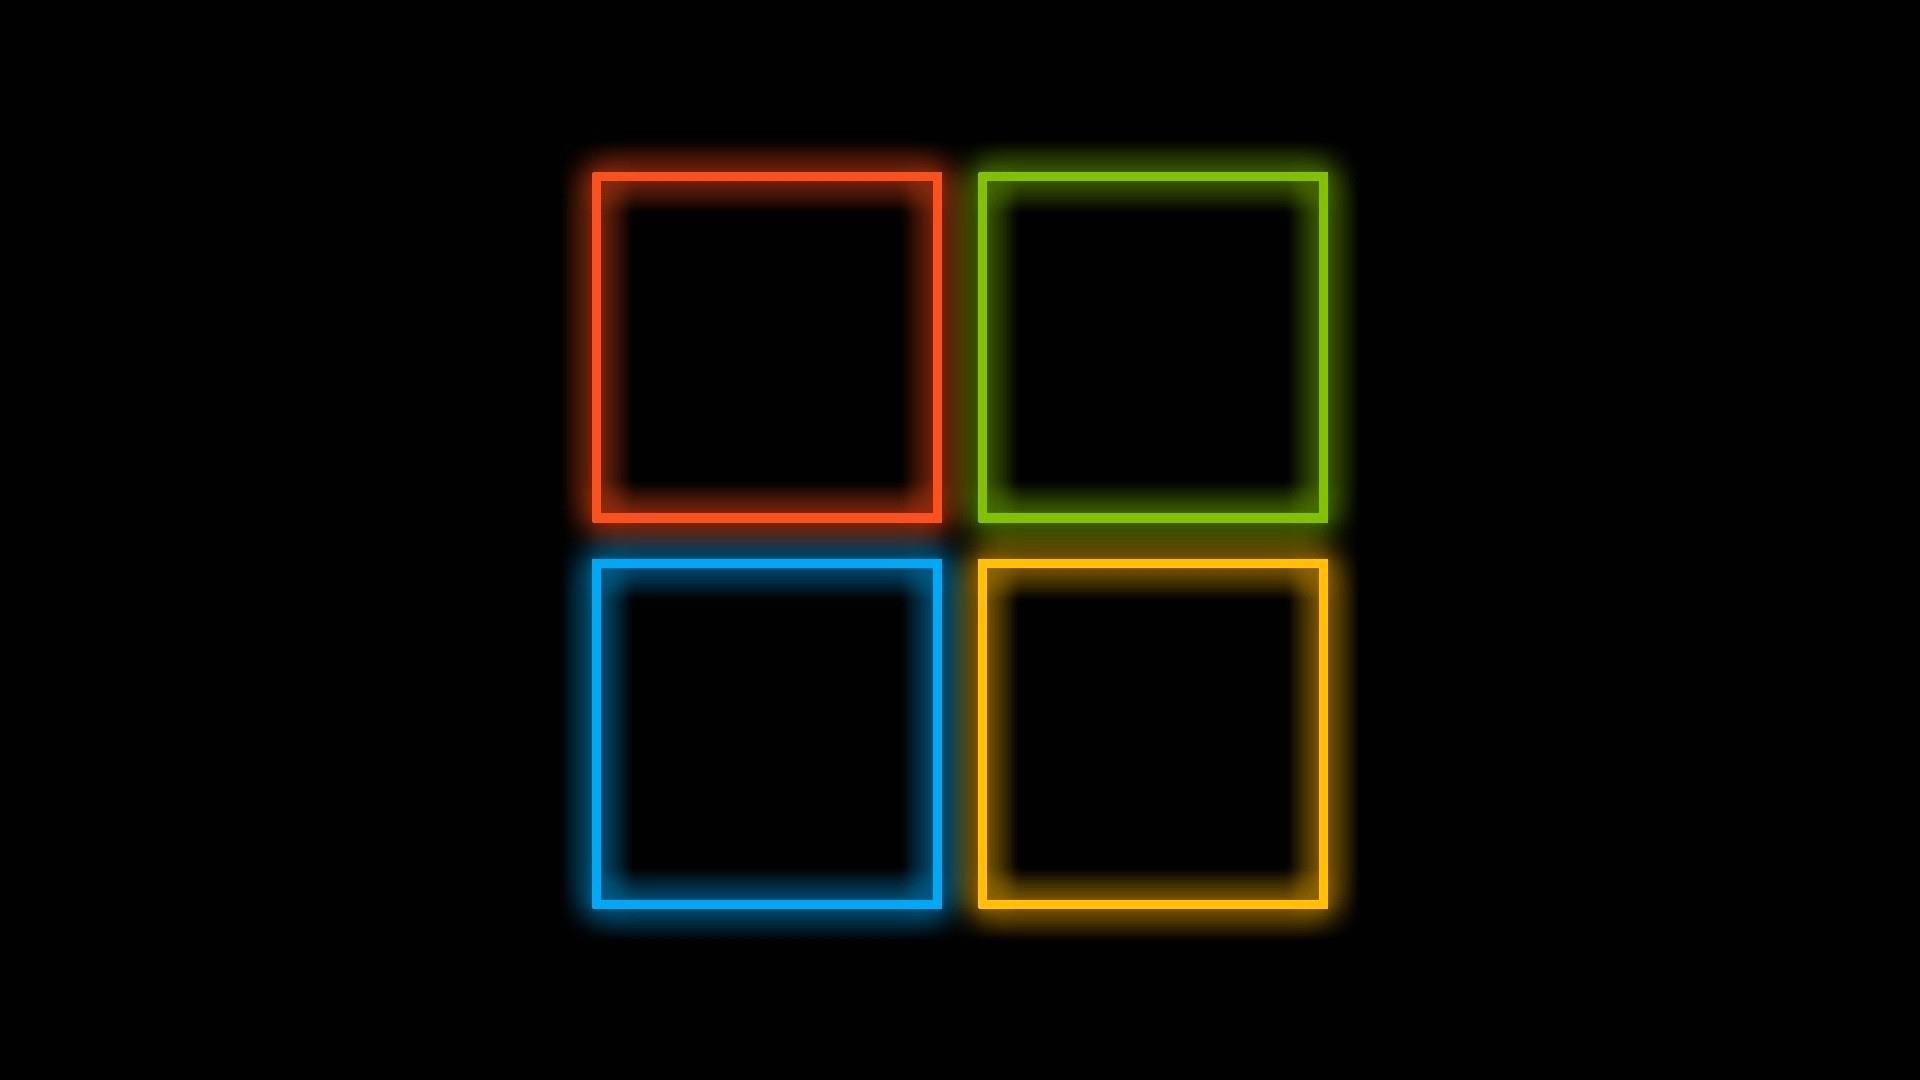 Hd Windows Wallpapers P